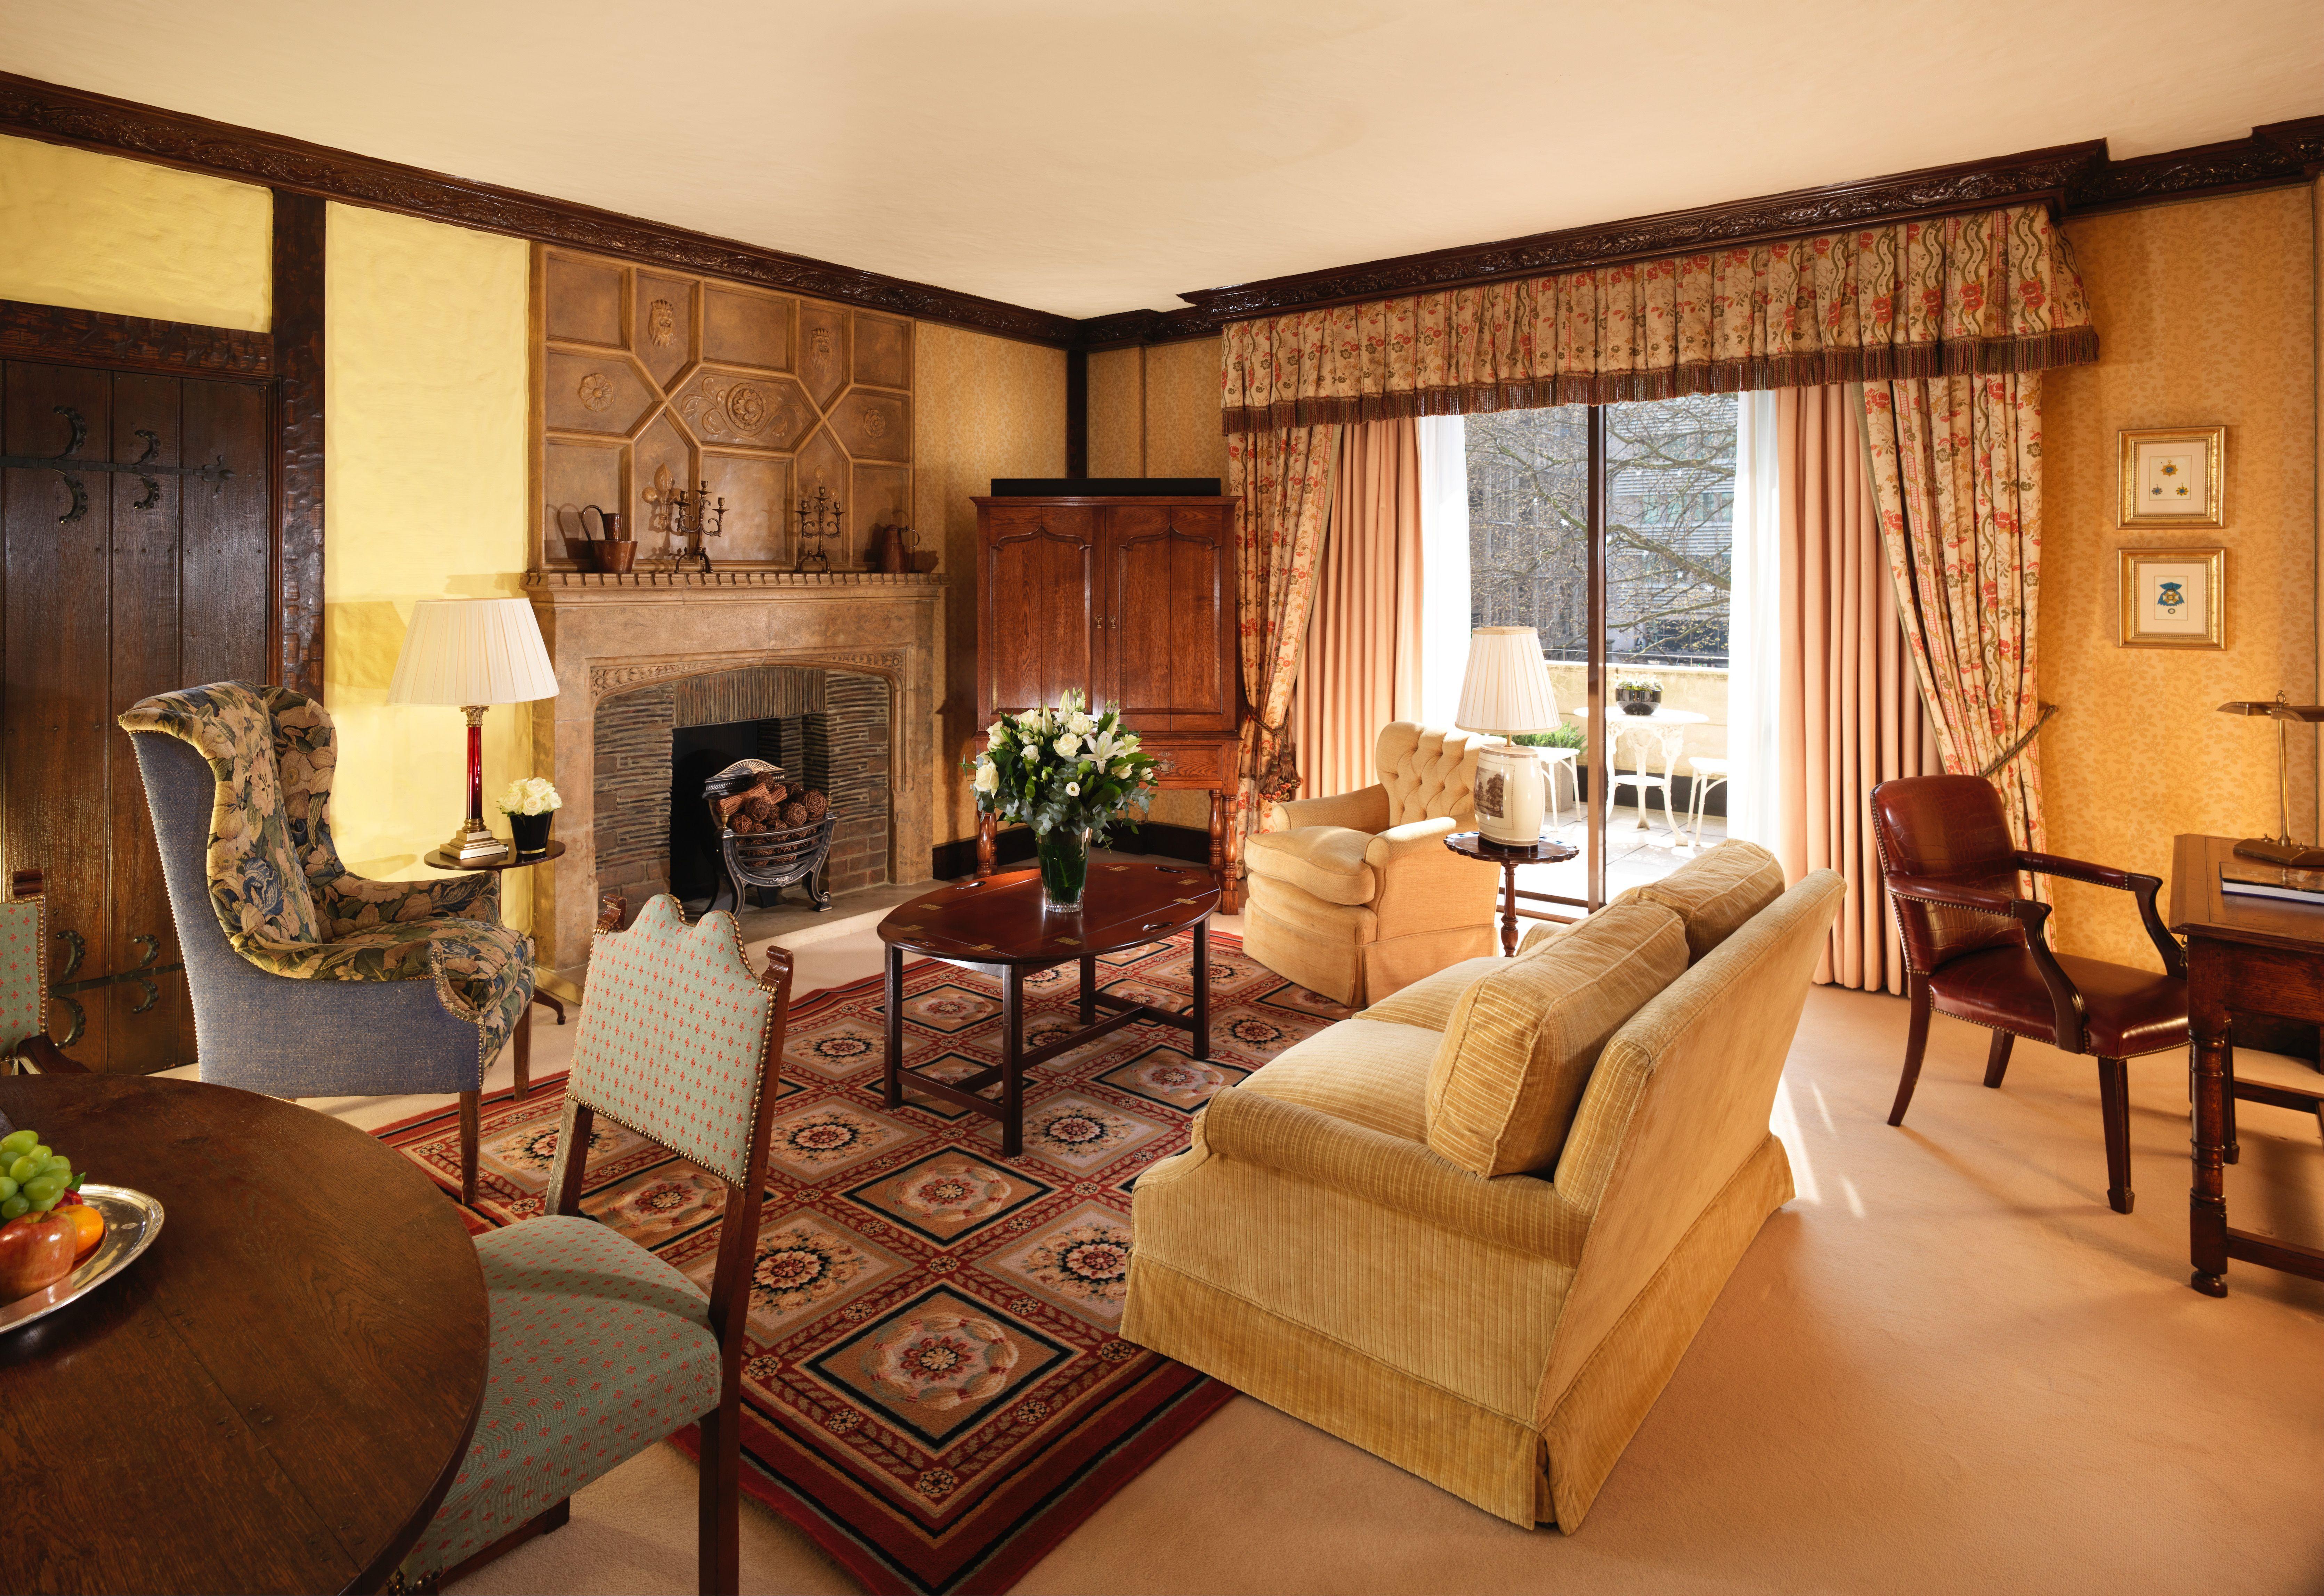 Eisenhower Suite Luxury Hotel Rooms Suites London 5 Star